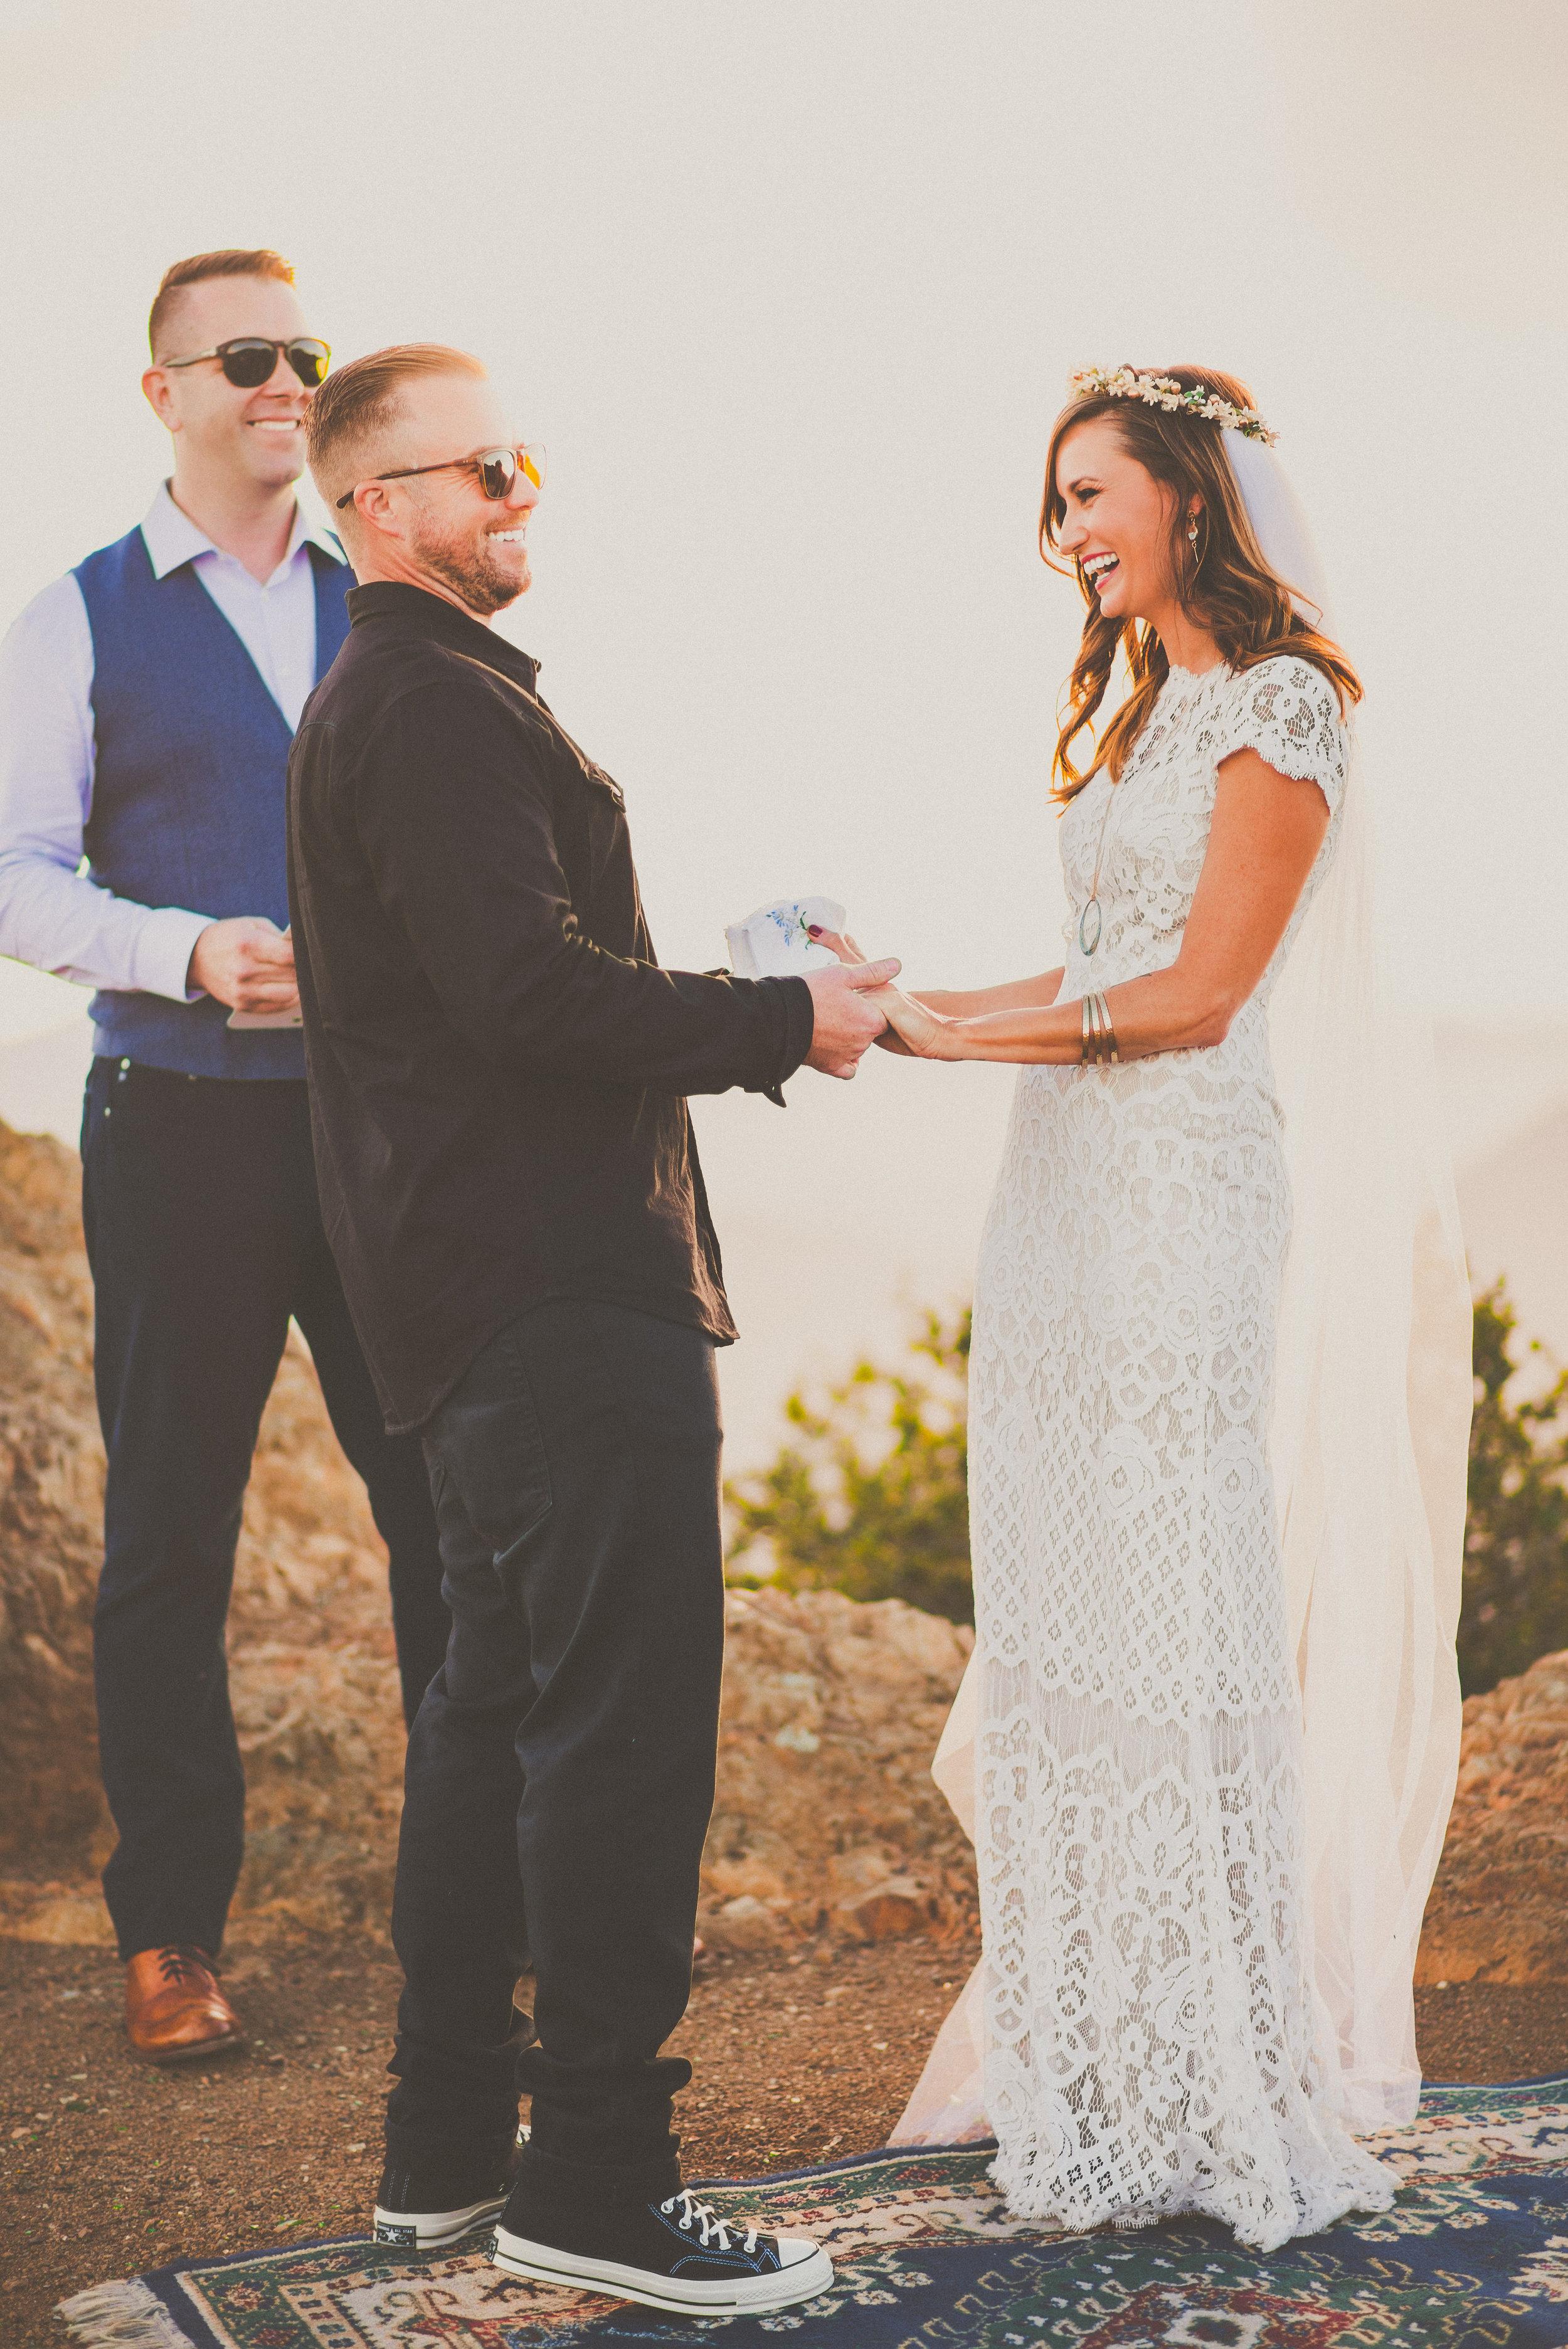 Megan & Luke - Ceremony-36.jpg